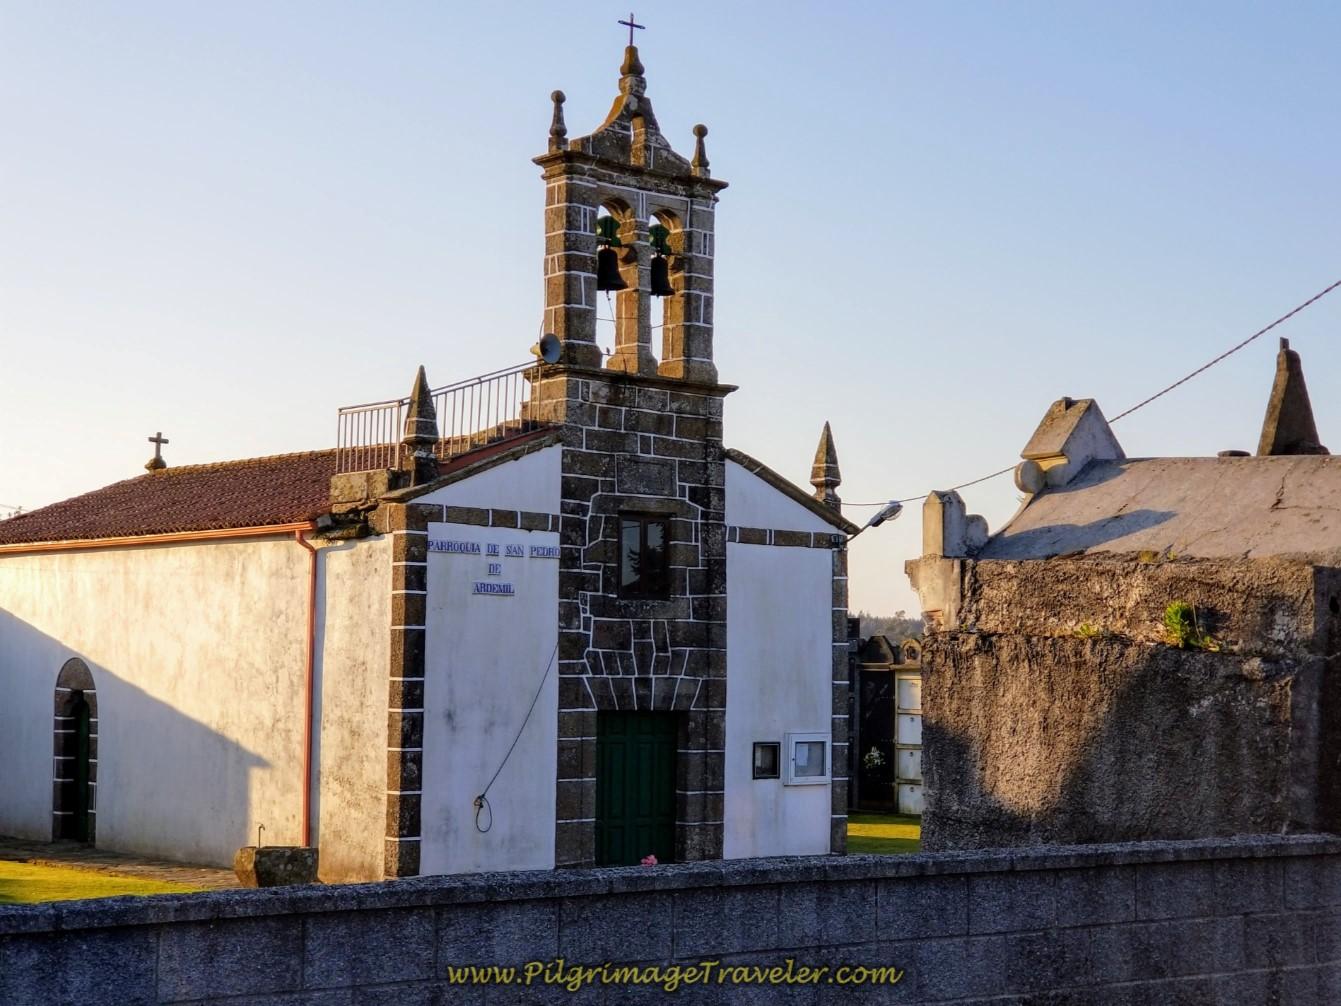 Parroquial de San Pedro de Ardemil on day seven of the Camino Inglés